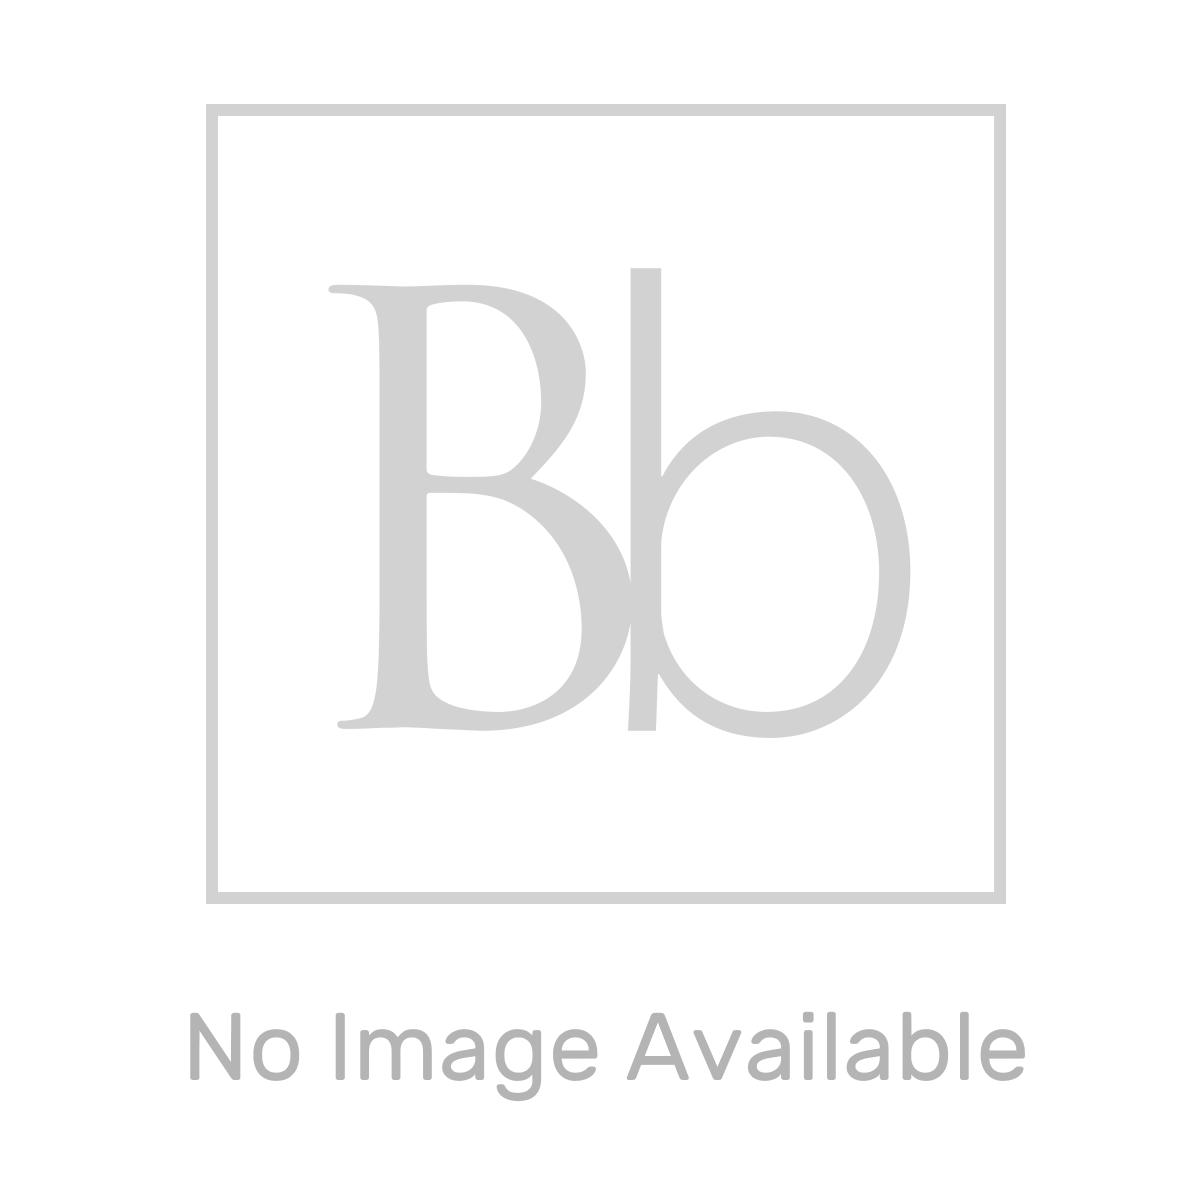 Cassellie Square Dual Lever Mono Kitchen Sink Mixer Tap